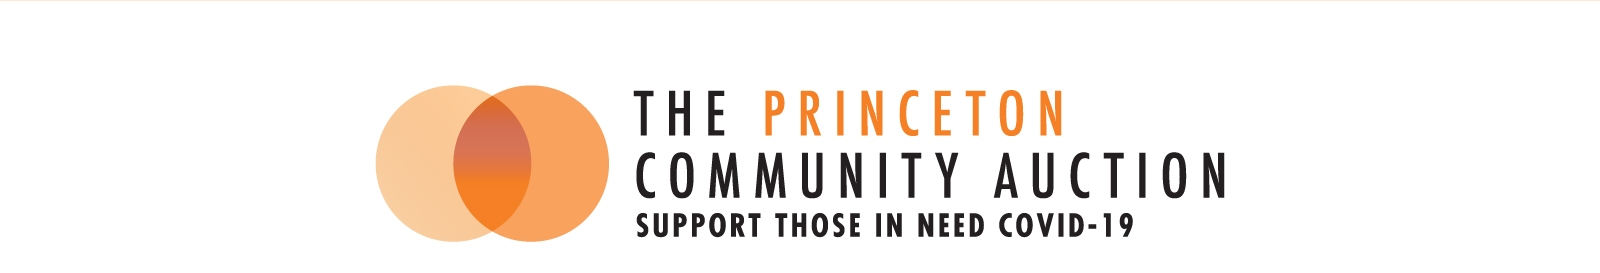 The princton community auction